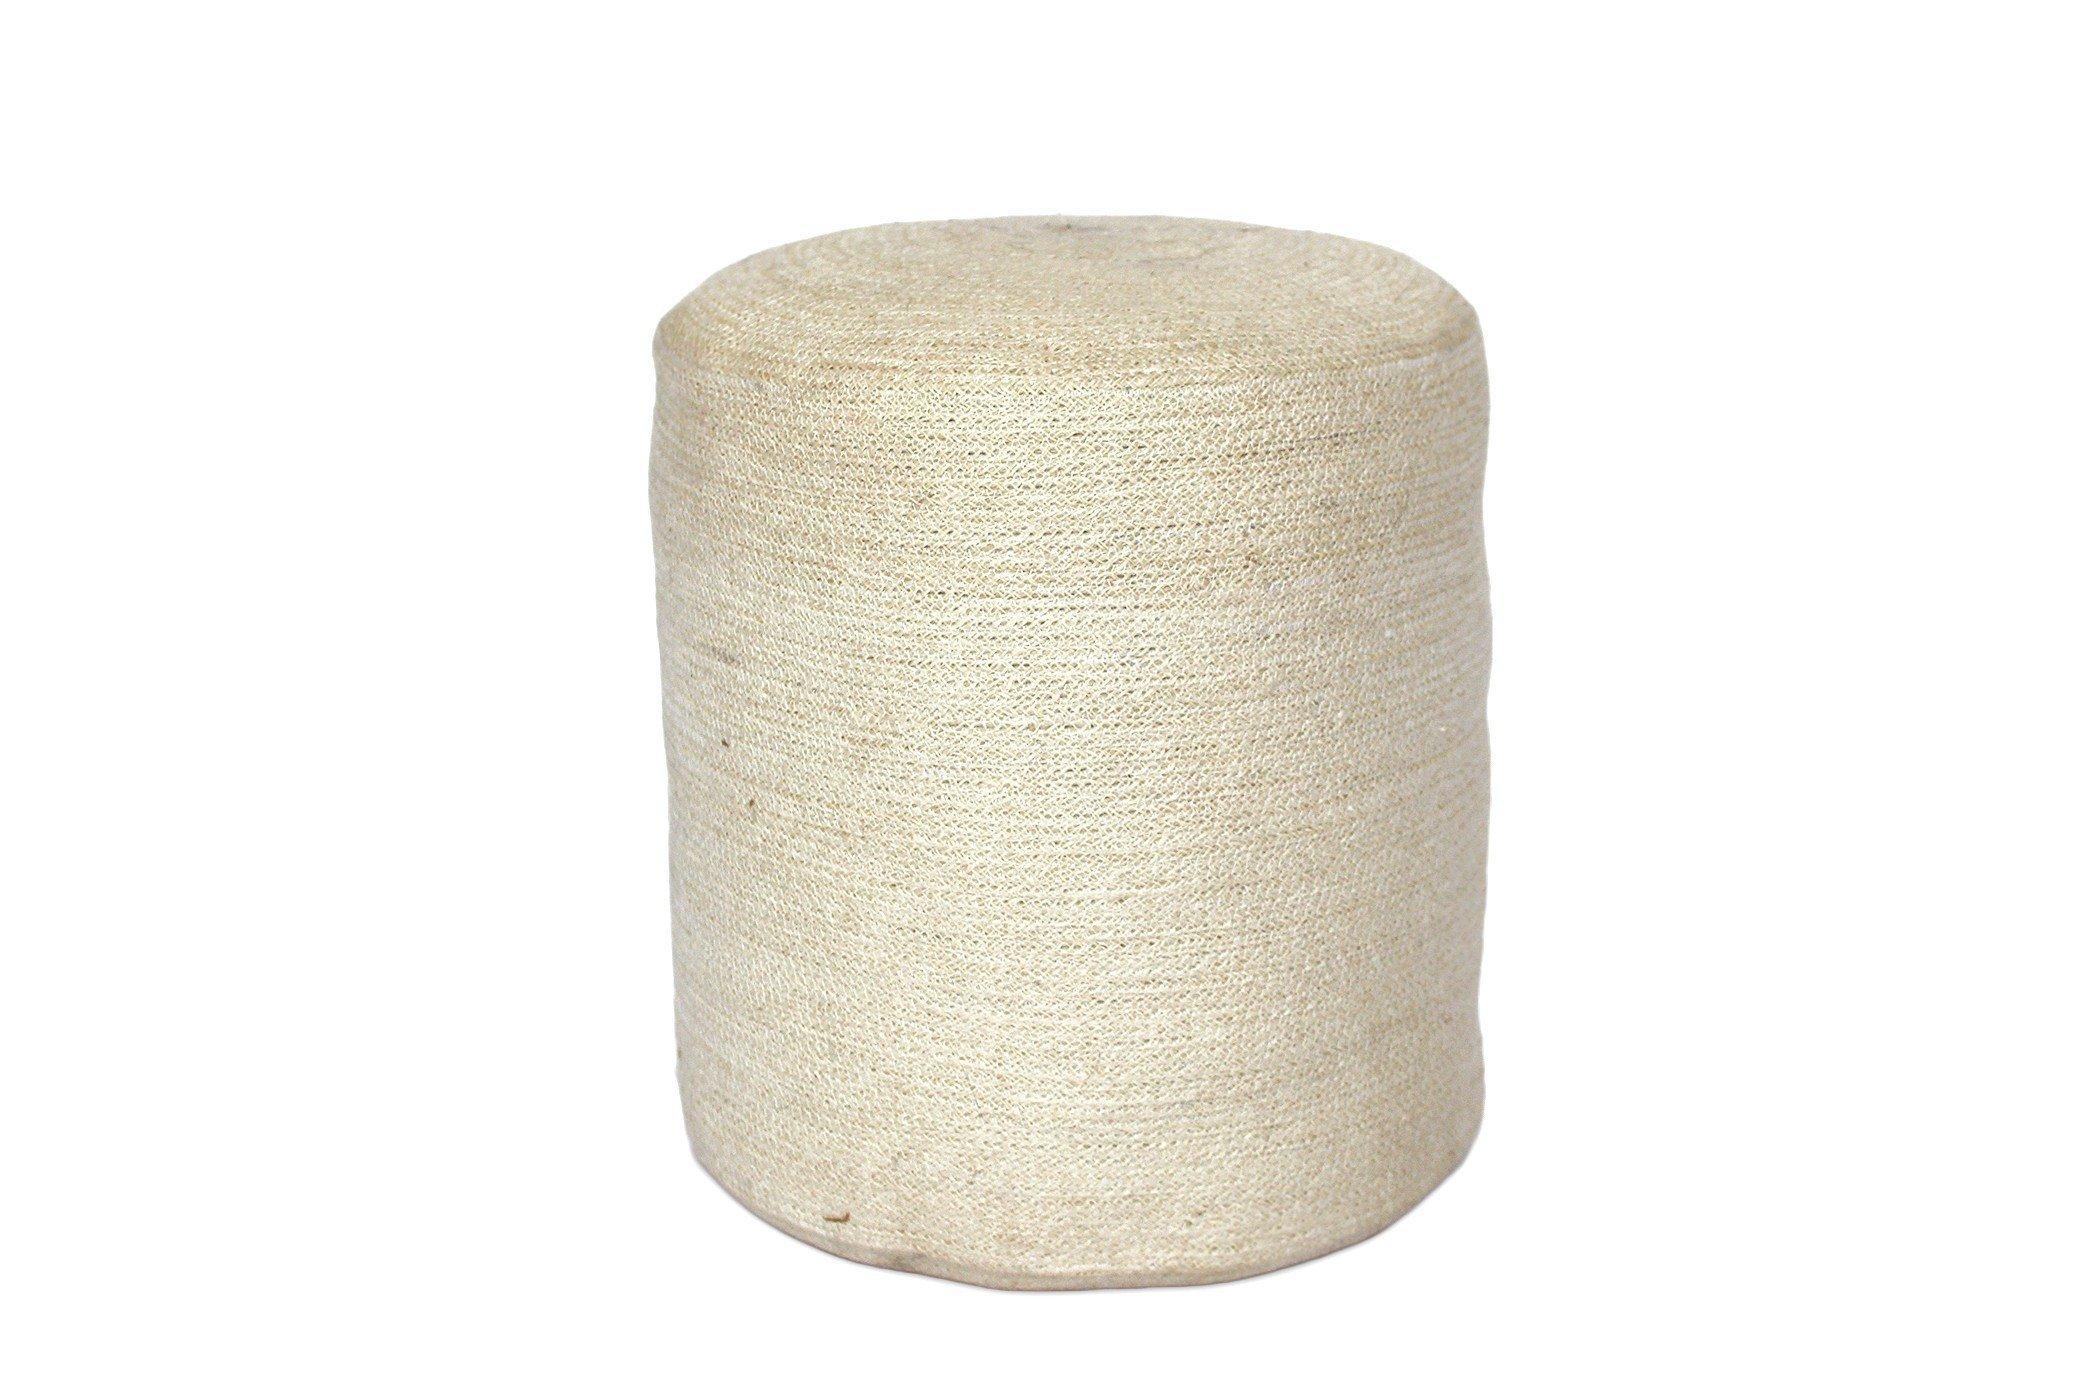 Saffron Trading Company Jute Round Pouf - Bleached White by Saffron Trading Company